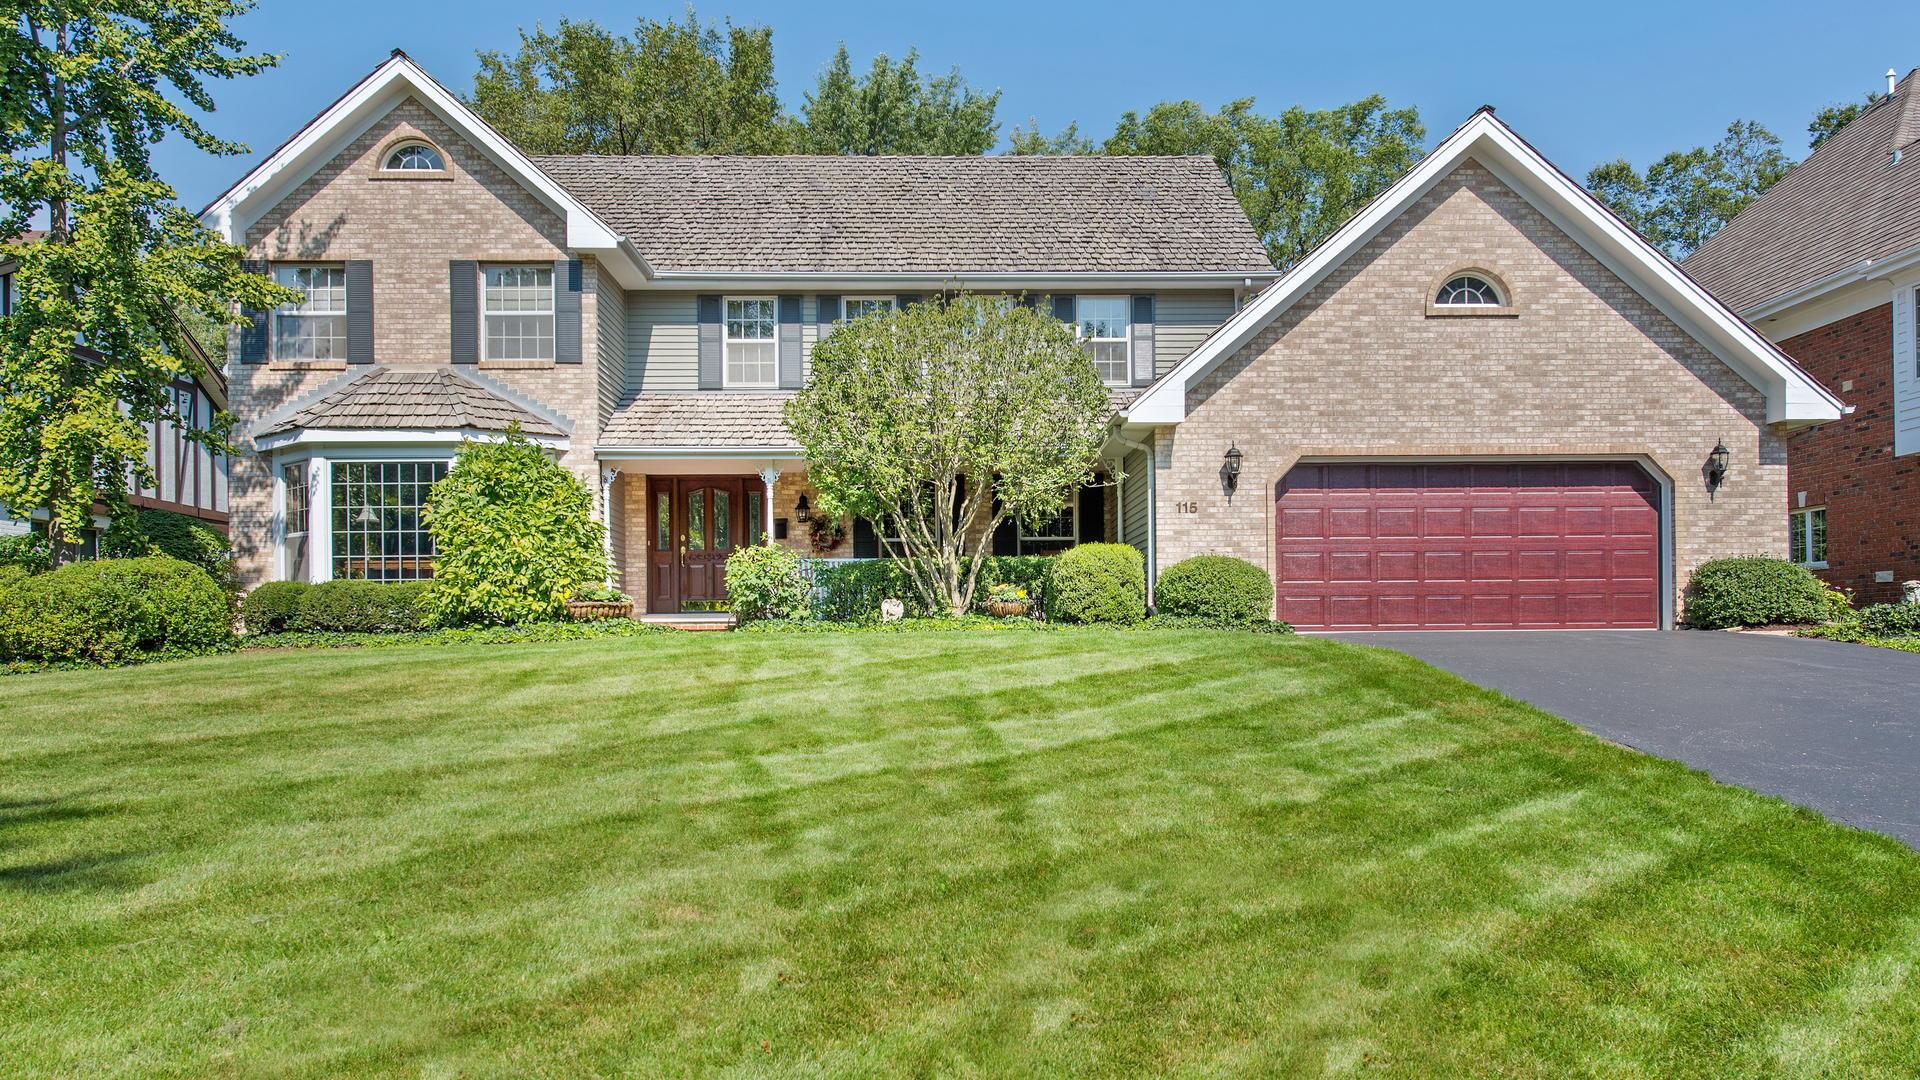 115 Eastern Avenue, Clarendon Hills, Illinois 60514